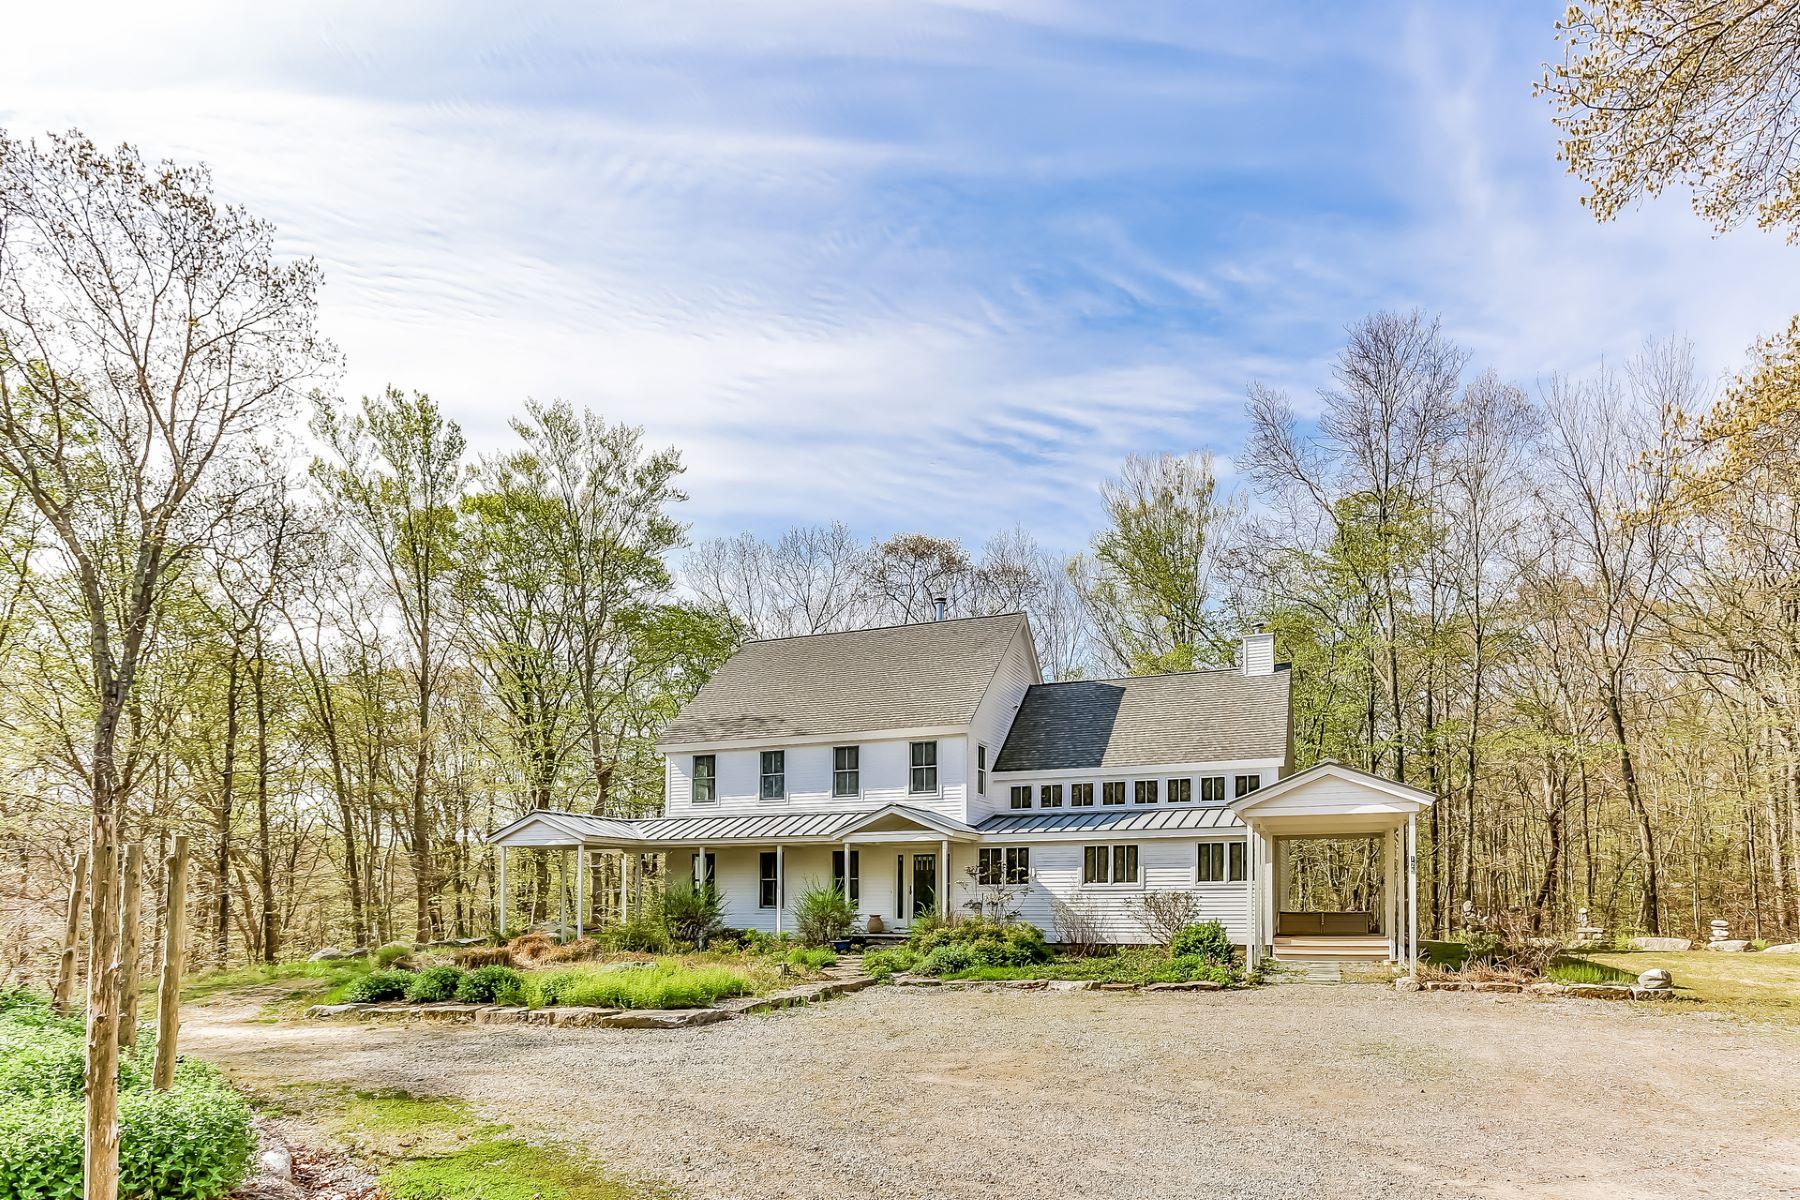 Einfamilienhaus für Verkauf beim Custom built home designed to blend the natural landscape with state of the art 125 Fishtown Road Groton, Connecticut, 06355 Vereinigte Staaten